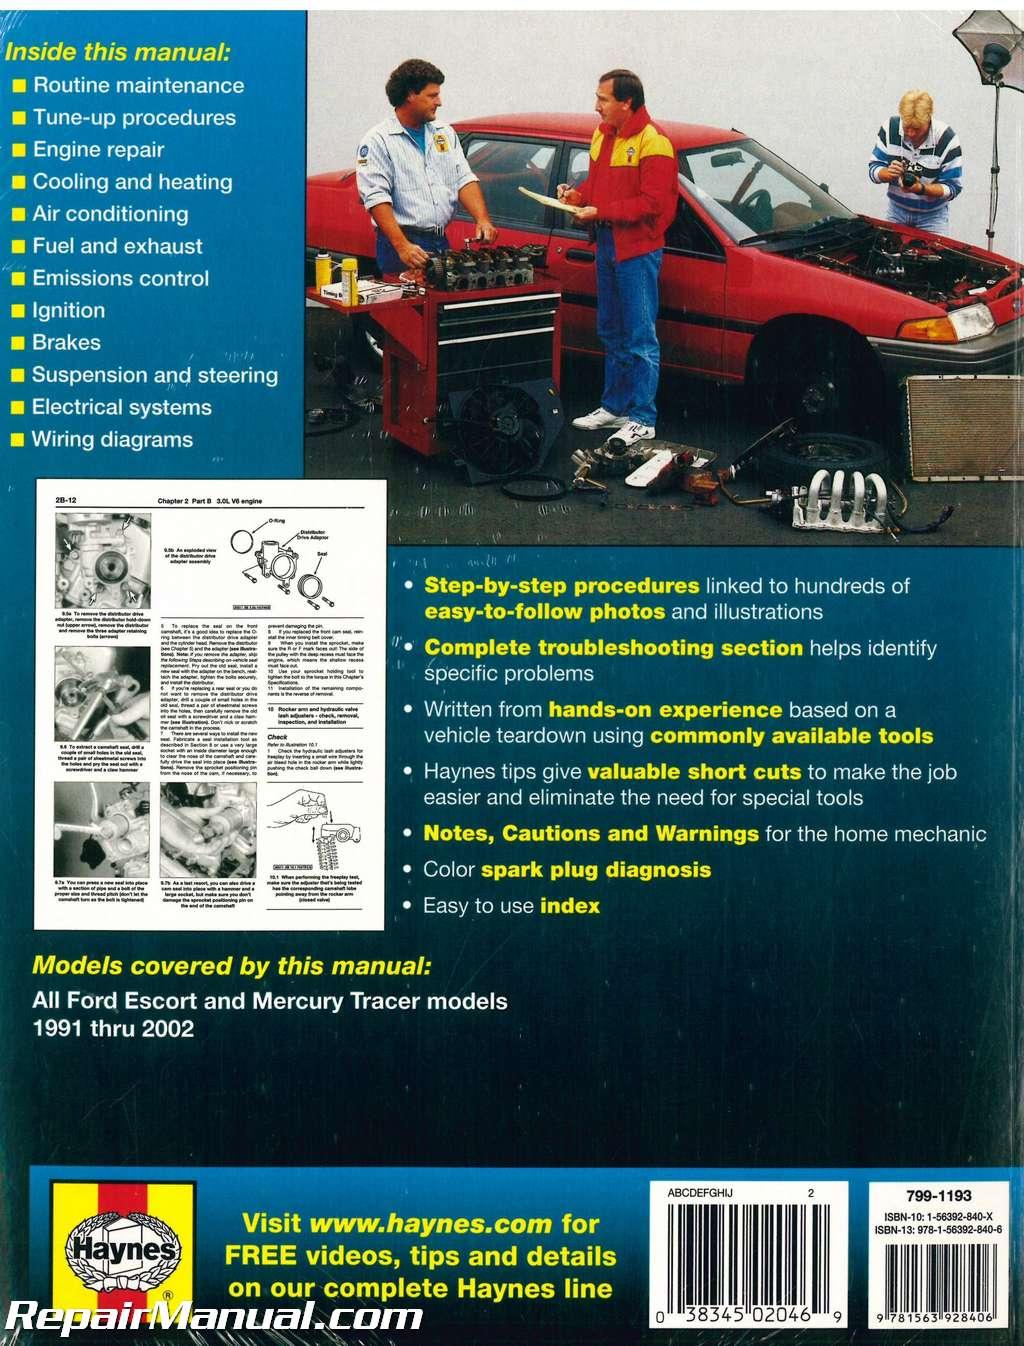 [DIAGRAM_1CA]  1991-2002 Ford Escort and Mercury Tracer Automobile Repair Manual by Haynes | 1991 Mercury Tracer Diagram Wiring Schematic |  | Repair Manuals Online